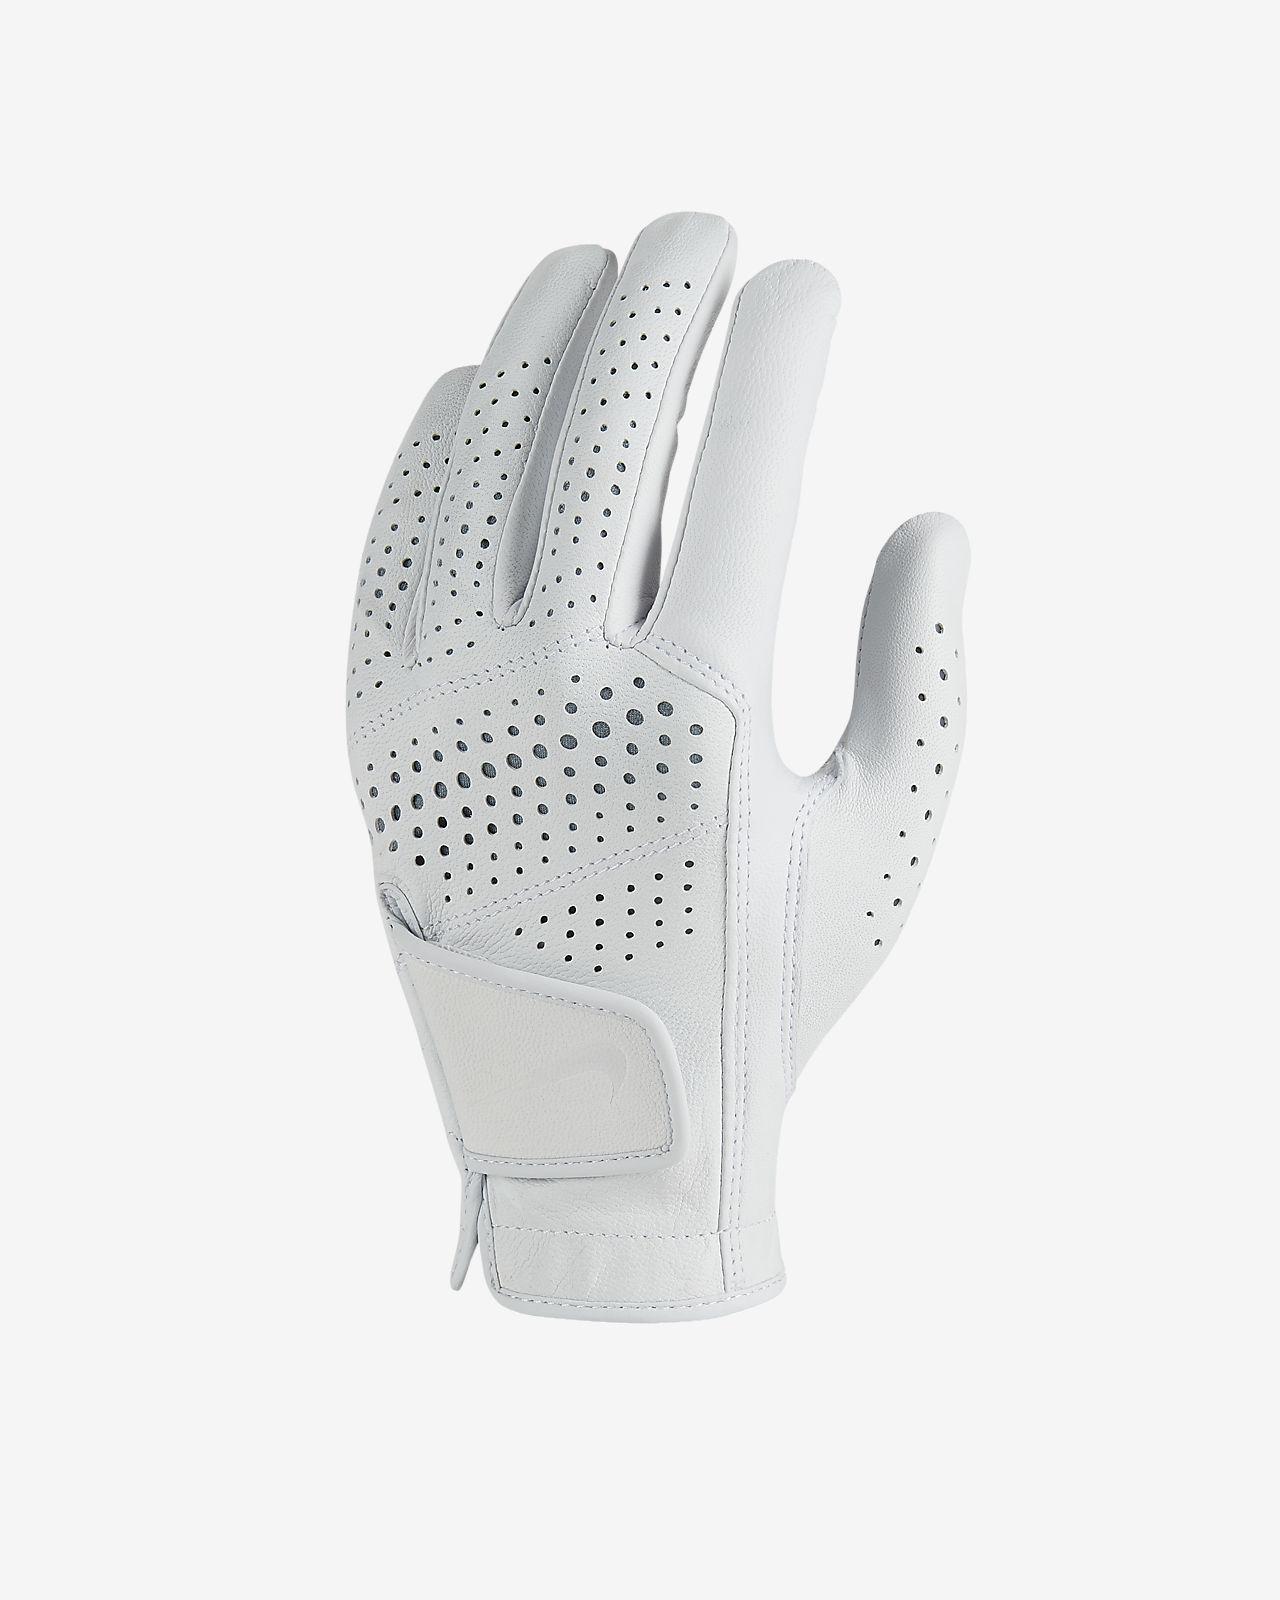 Nike Tour Classic II (Left Regular) Women's Golf Glove